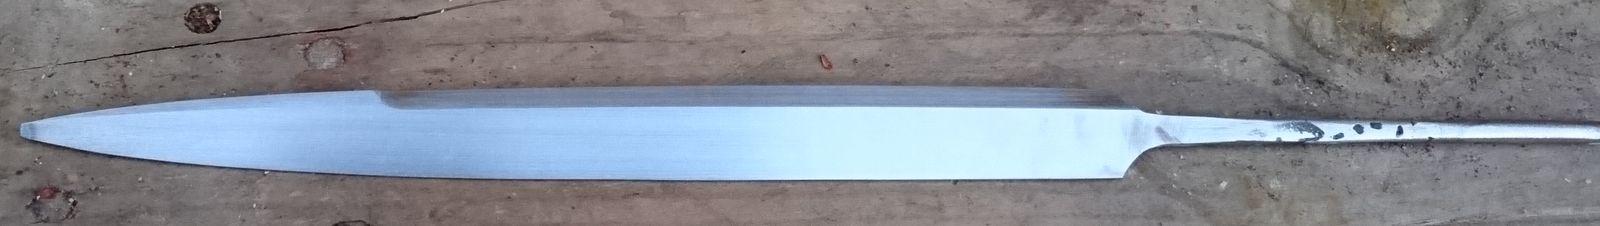 Ground blade shape.